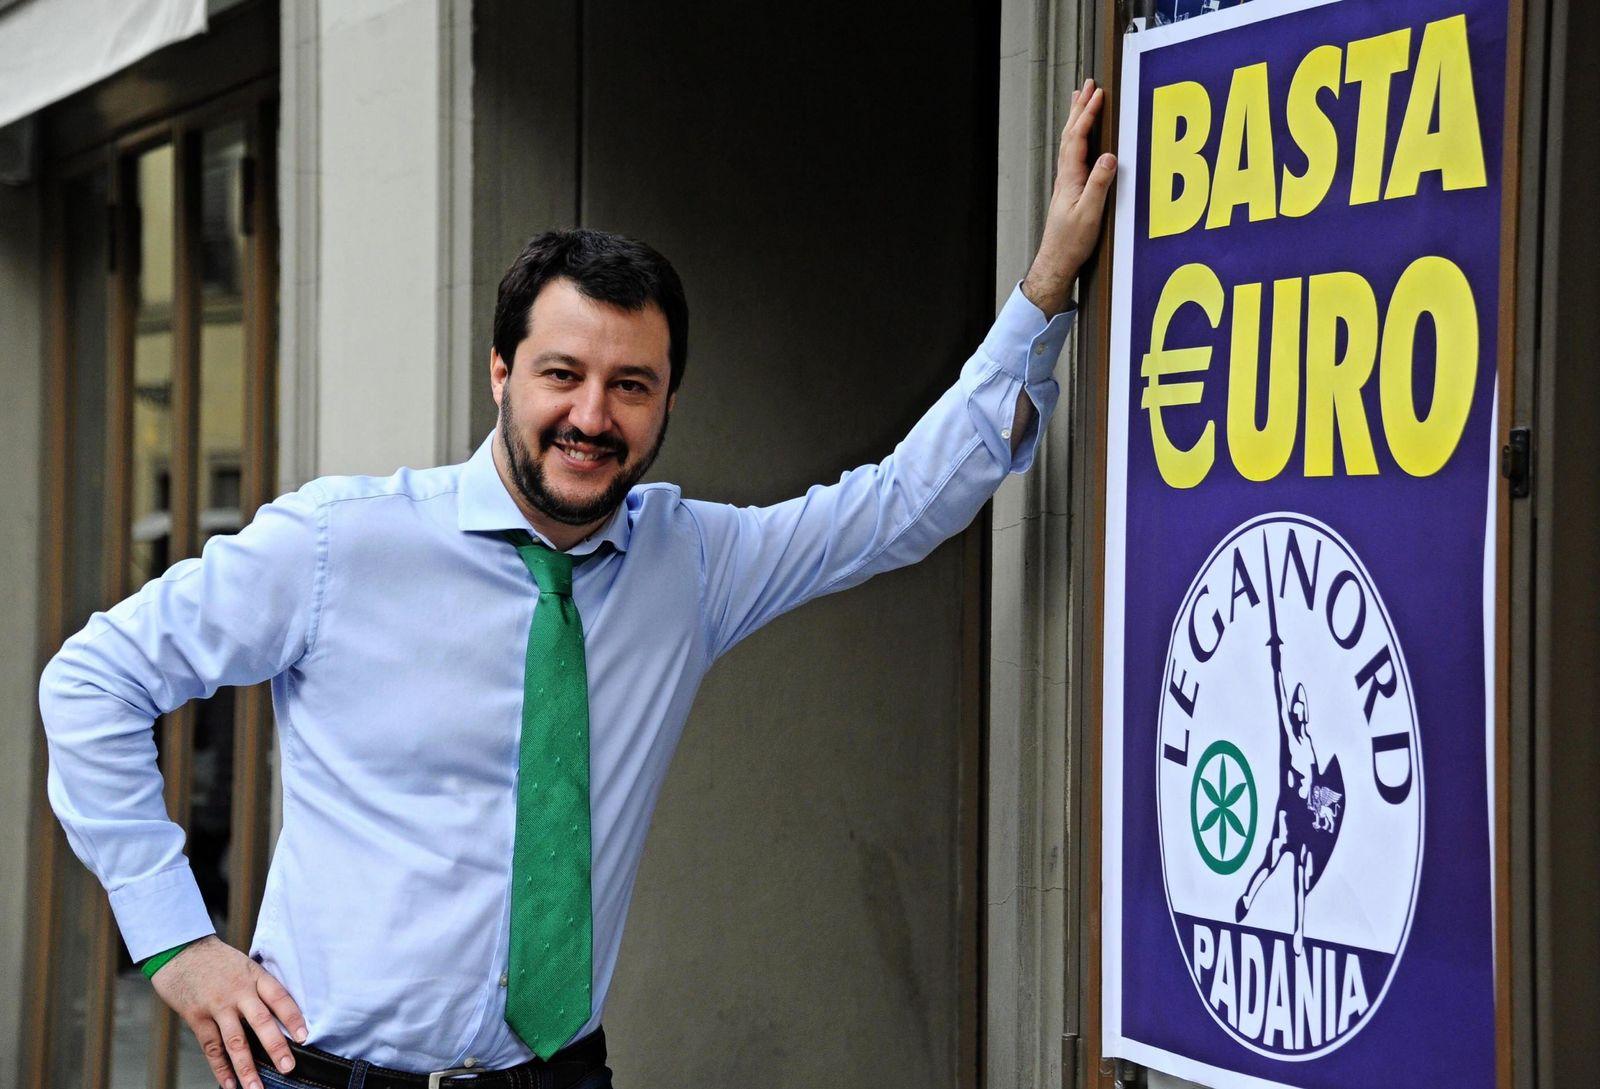 Matteo Salvini / Basta Euro